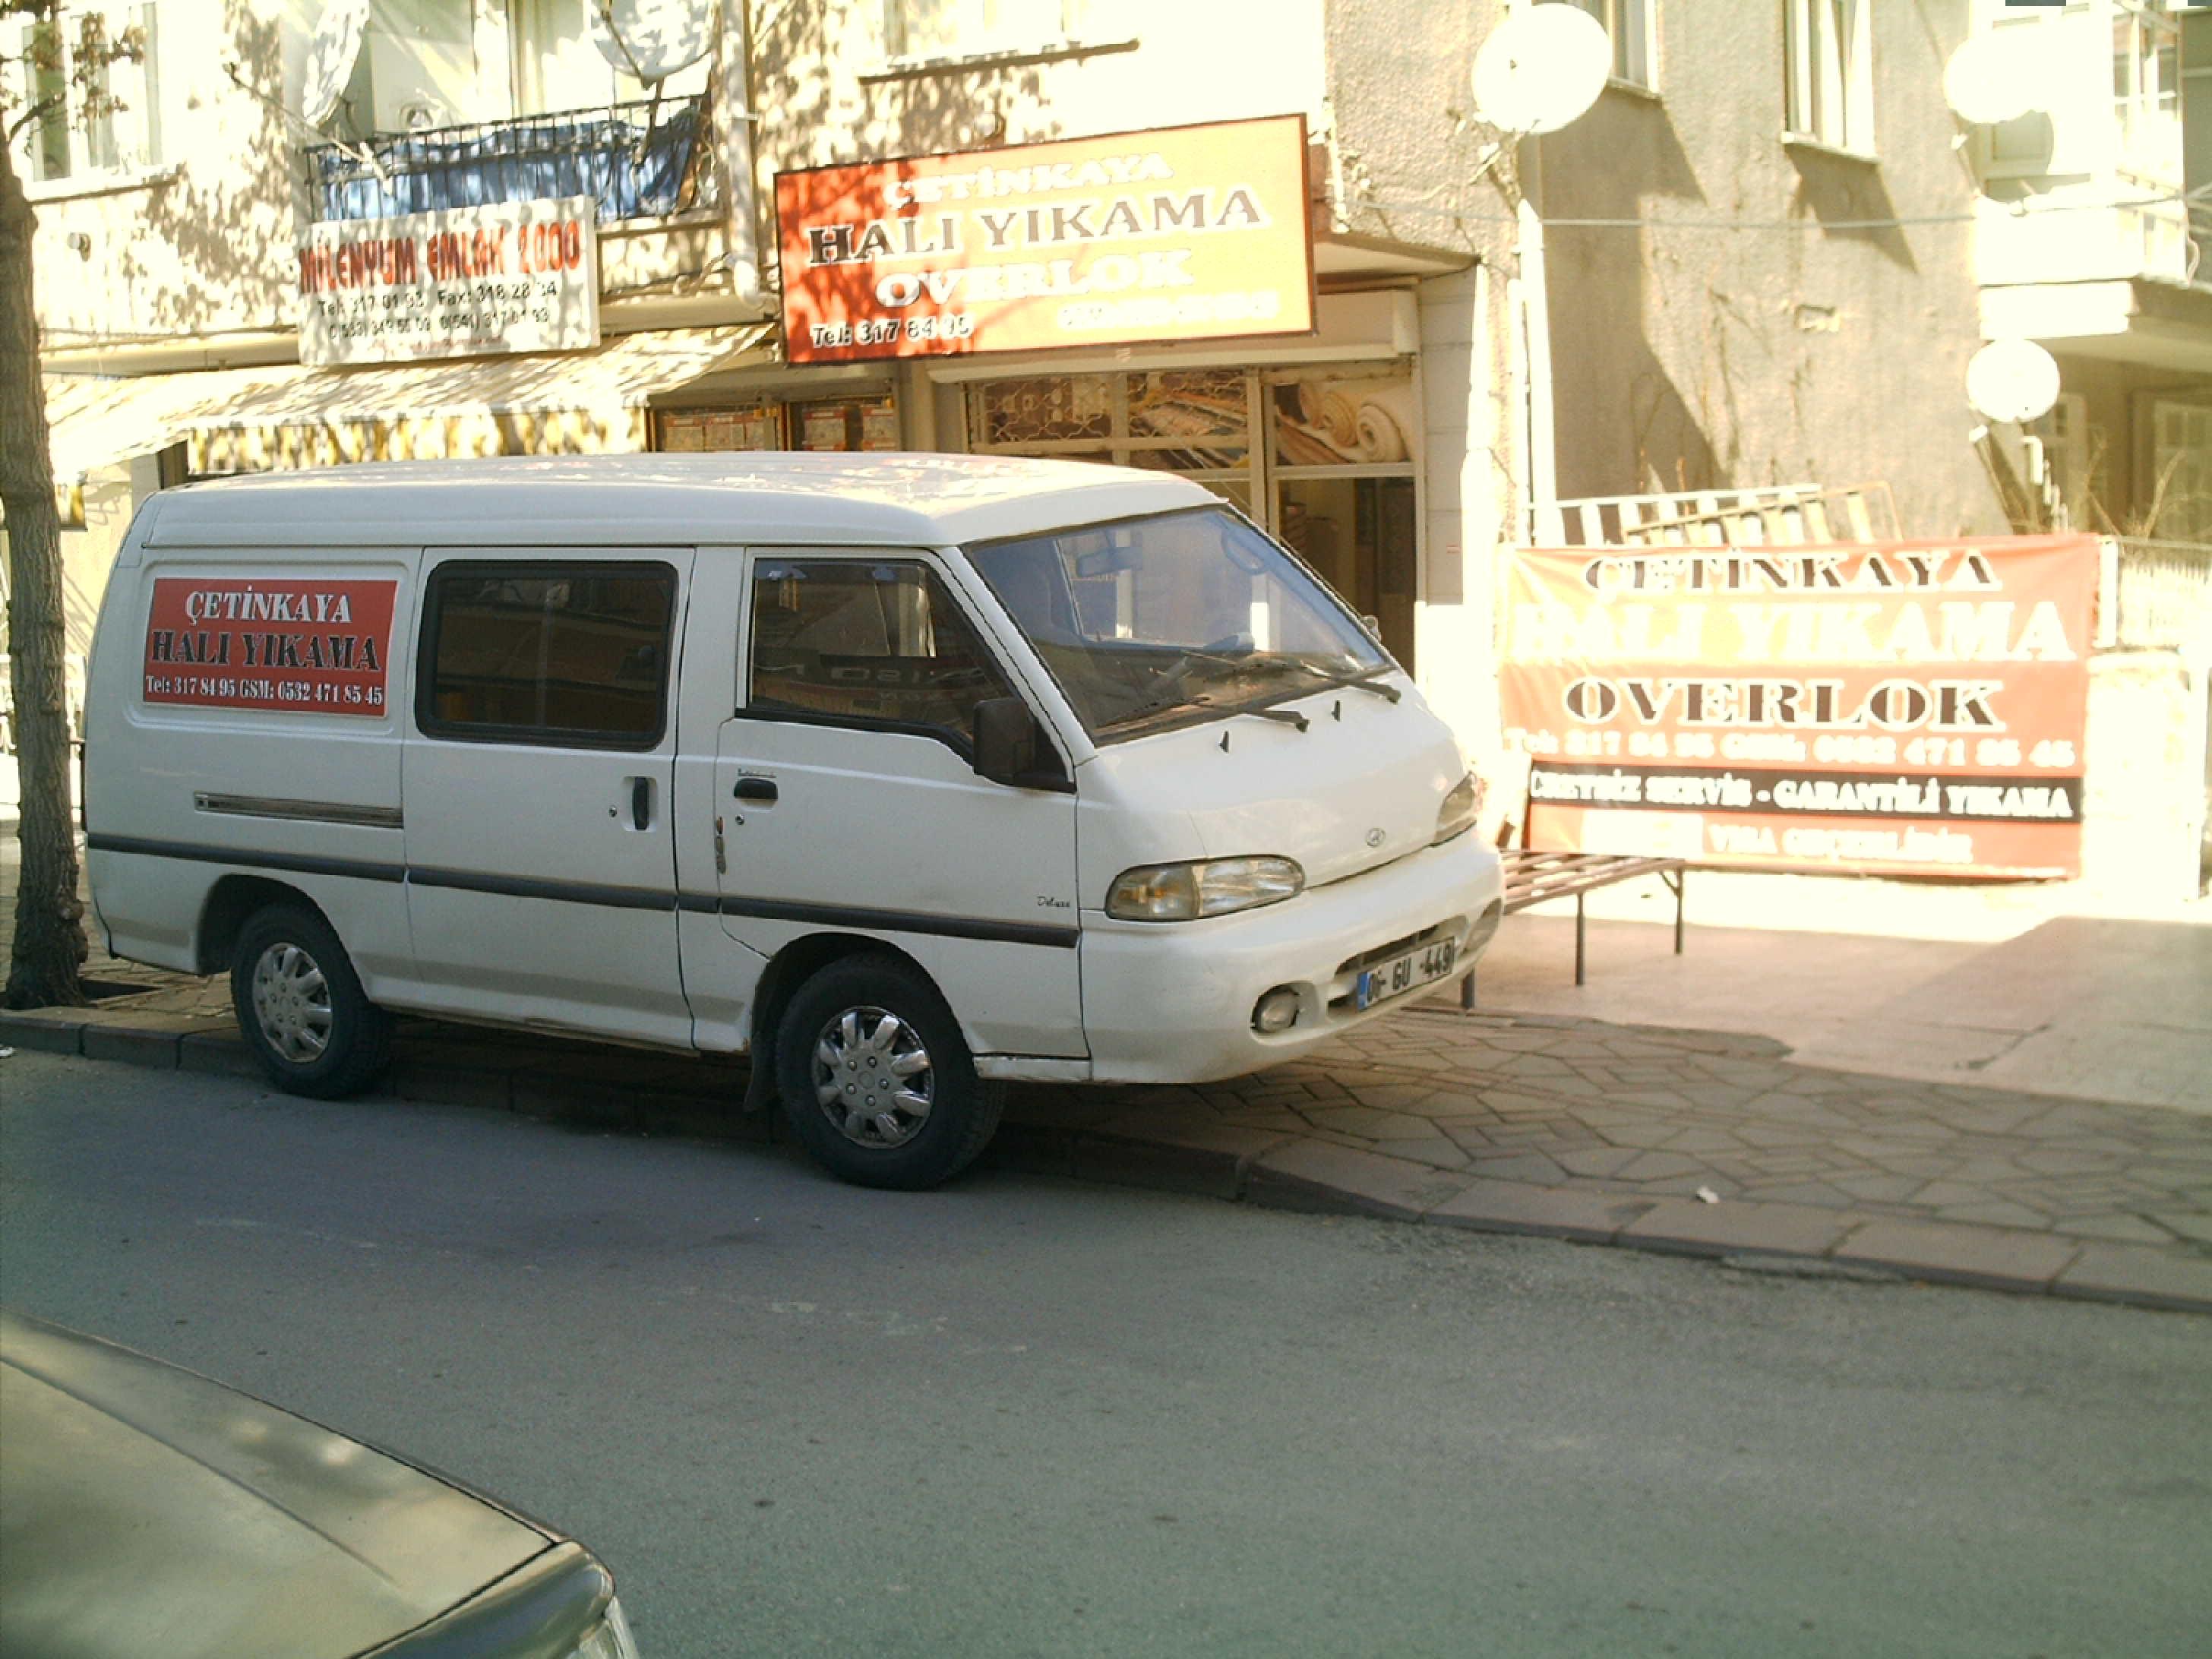 fatih_hali_yikama_servis-1 (1)